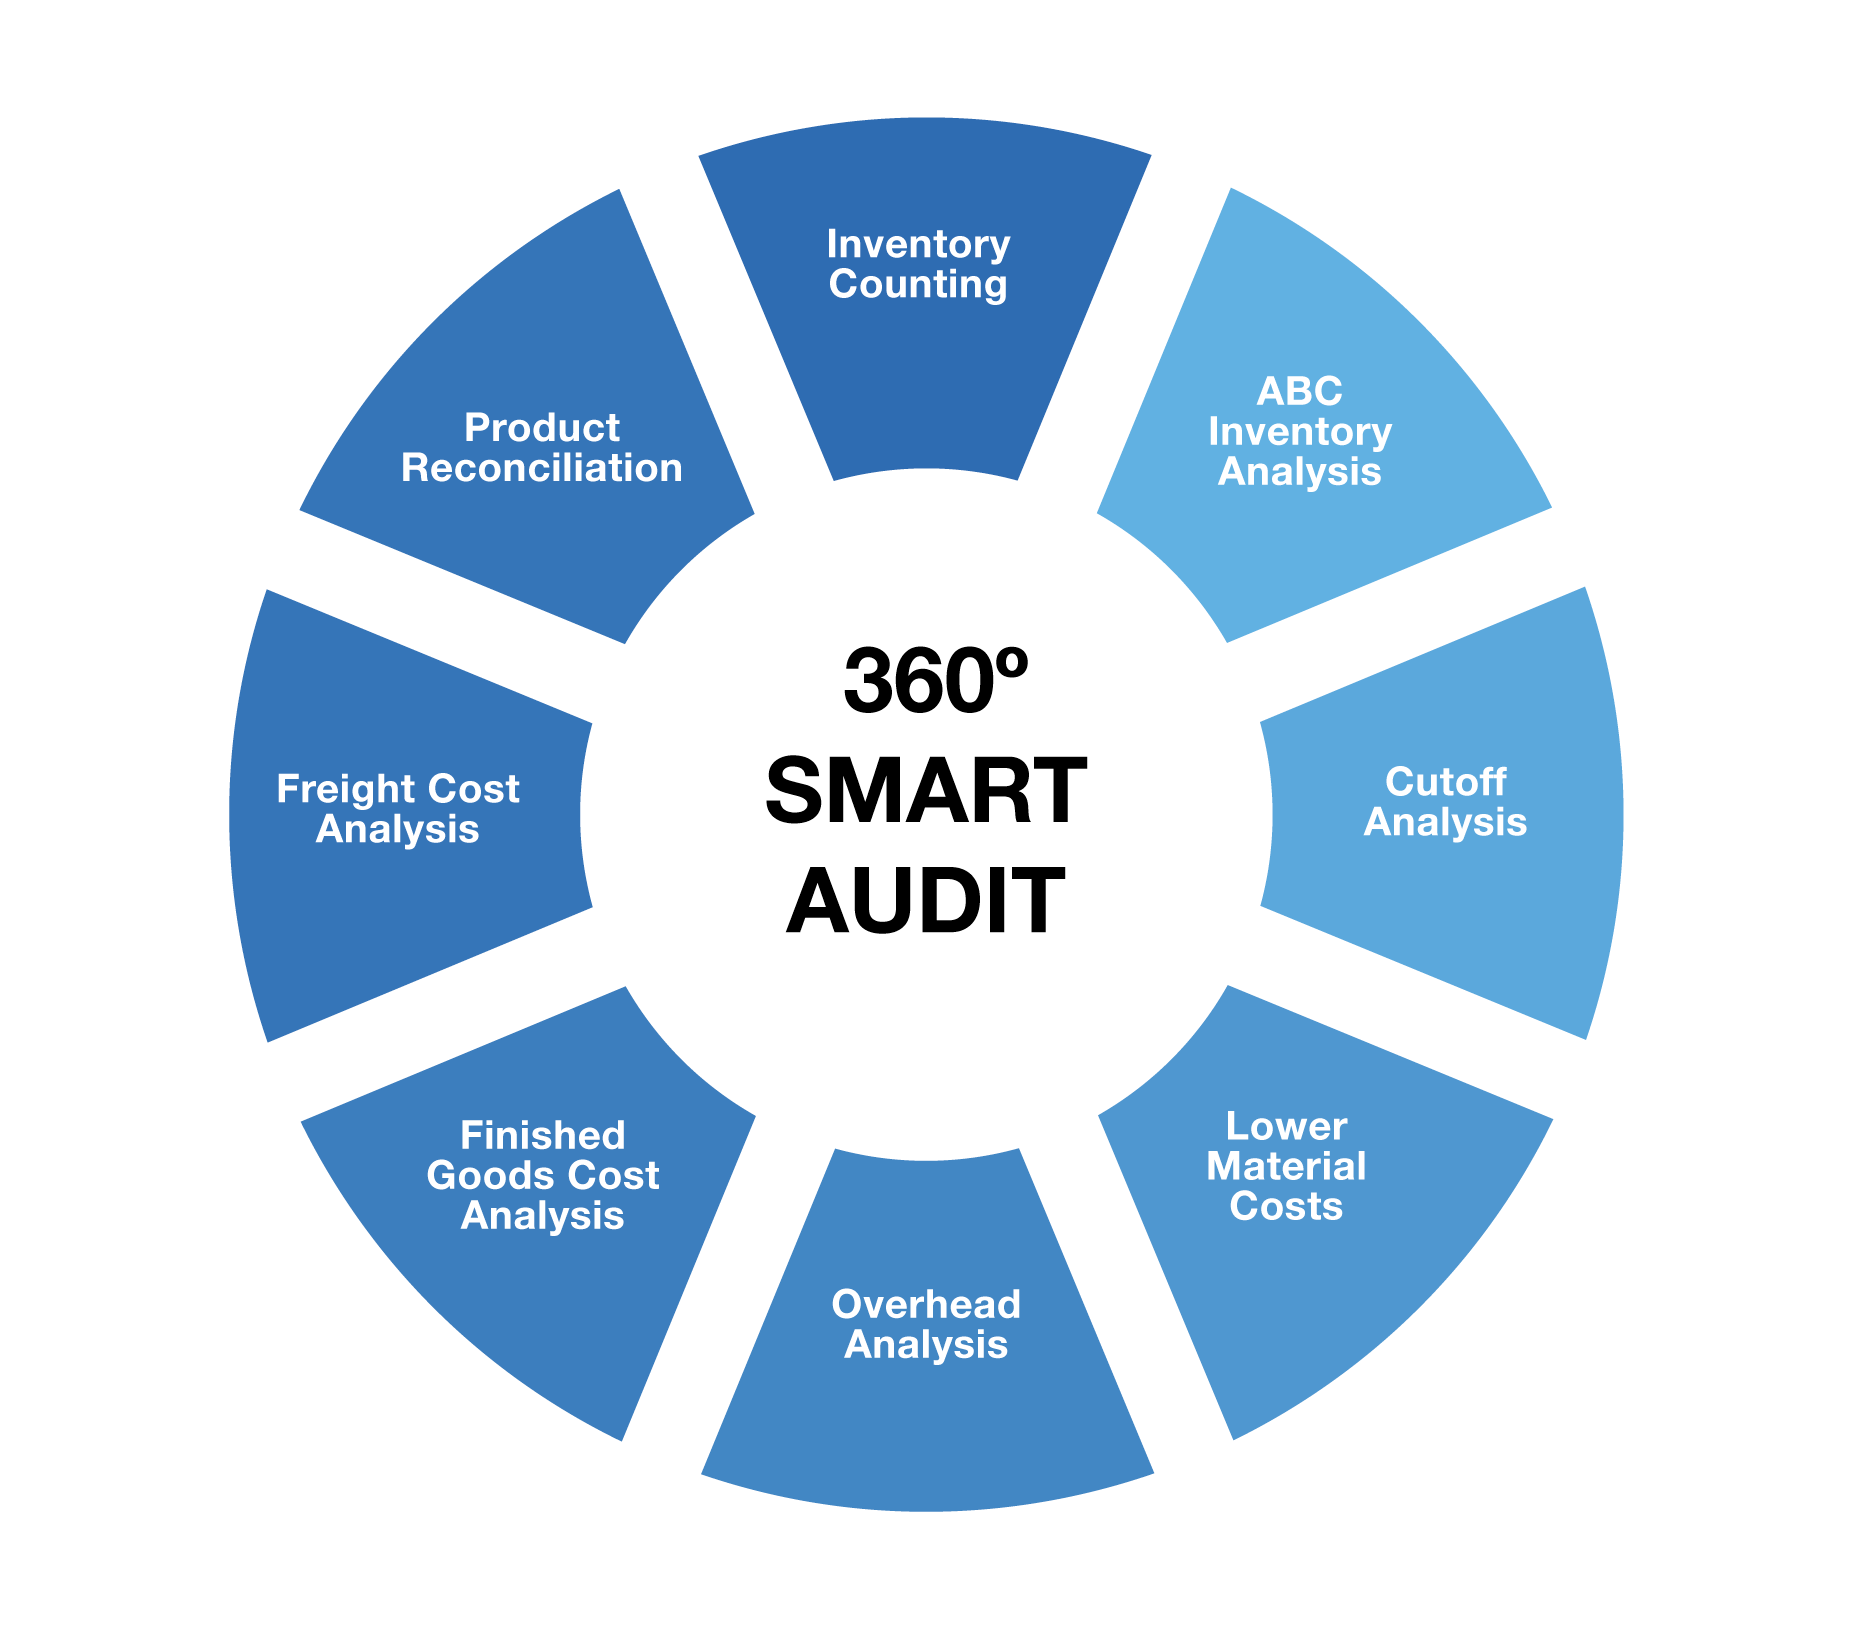 Inventory Auditing Procedures